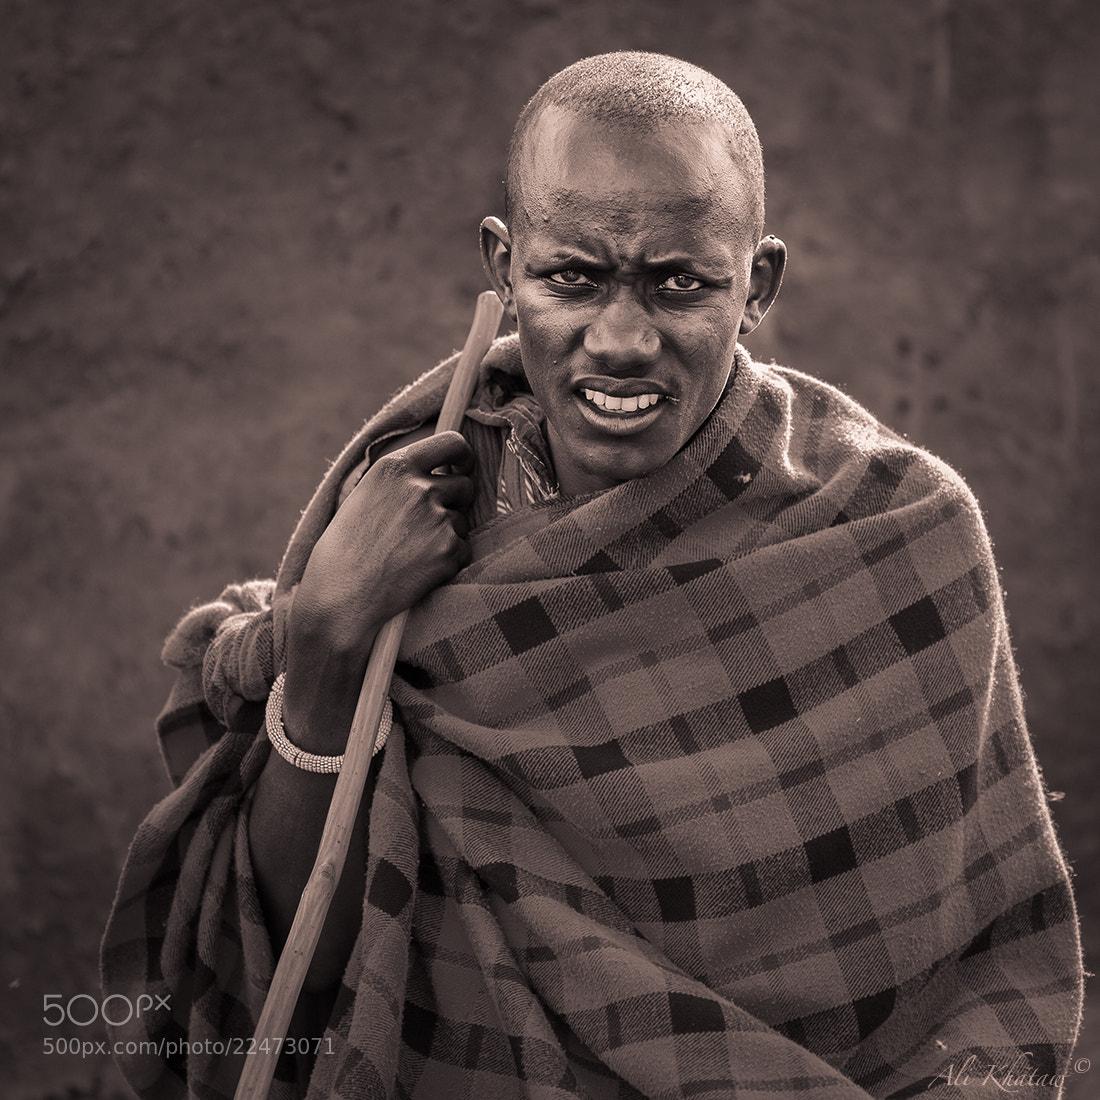 Photograph Masai Man by Ali Khataw on 500px